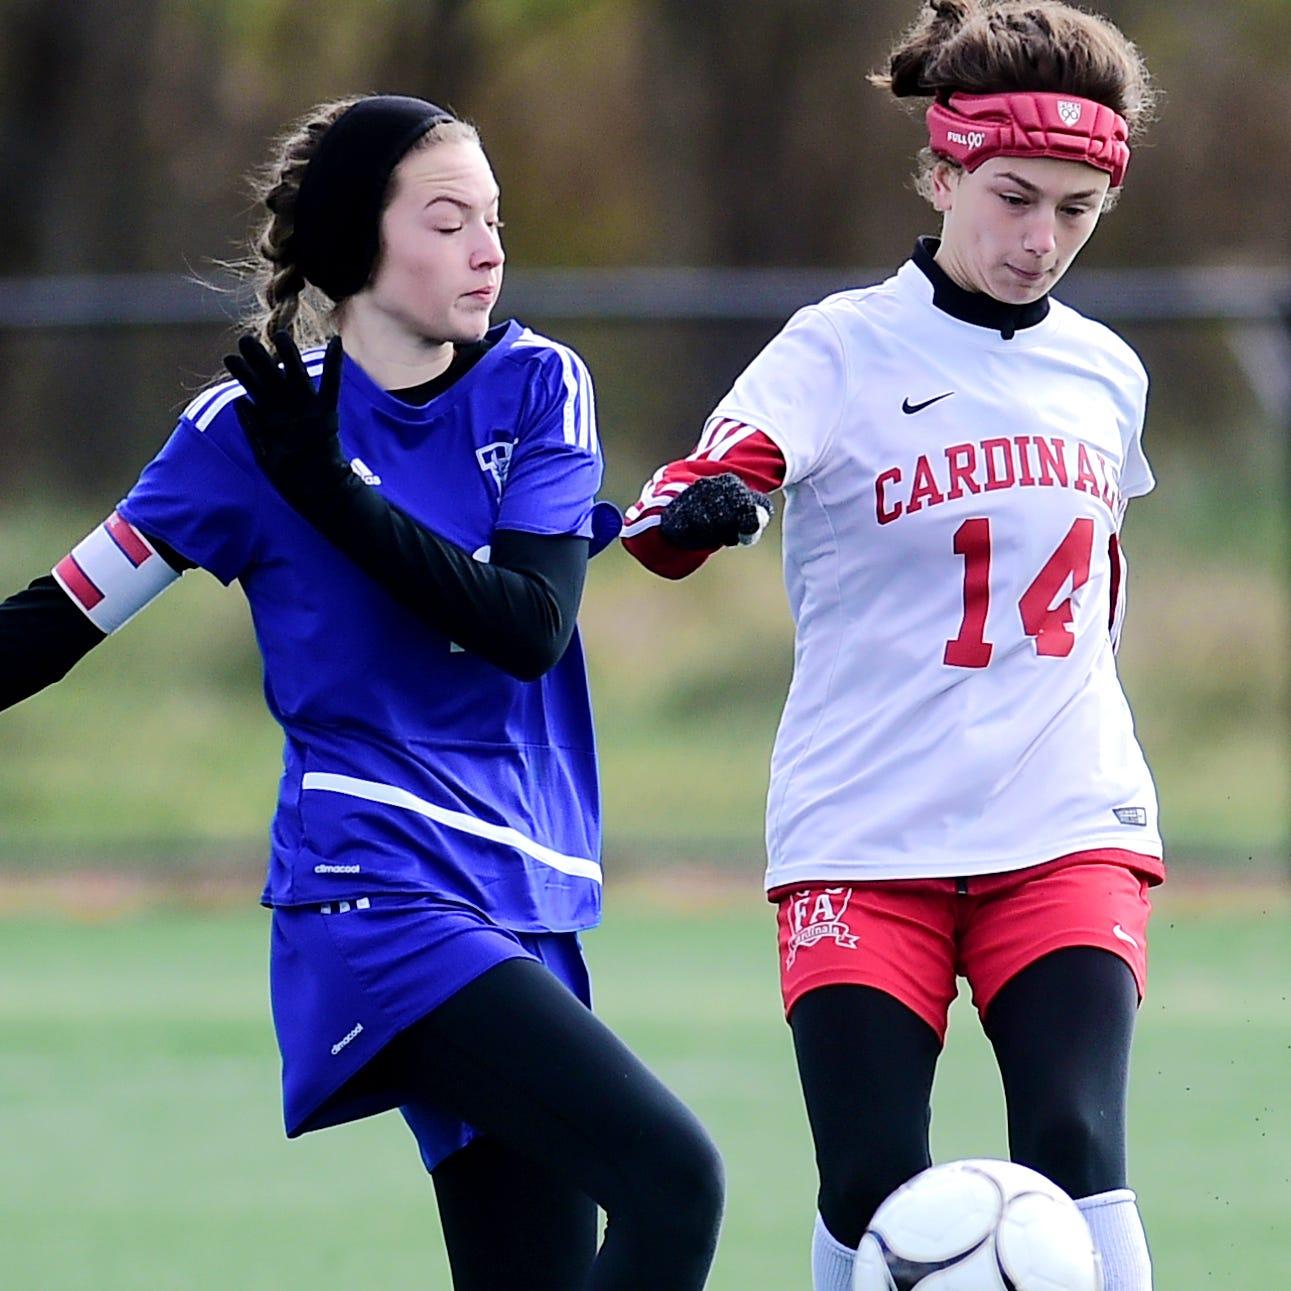 Kendall girls win state Class D soccer championship